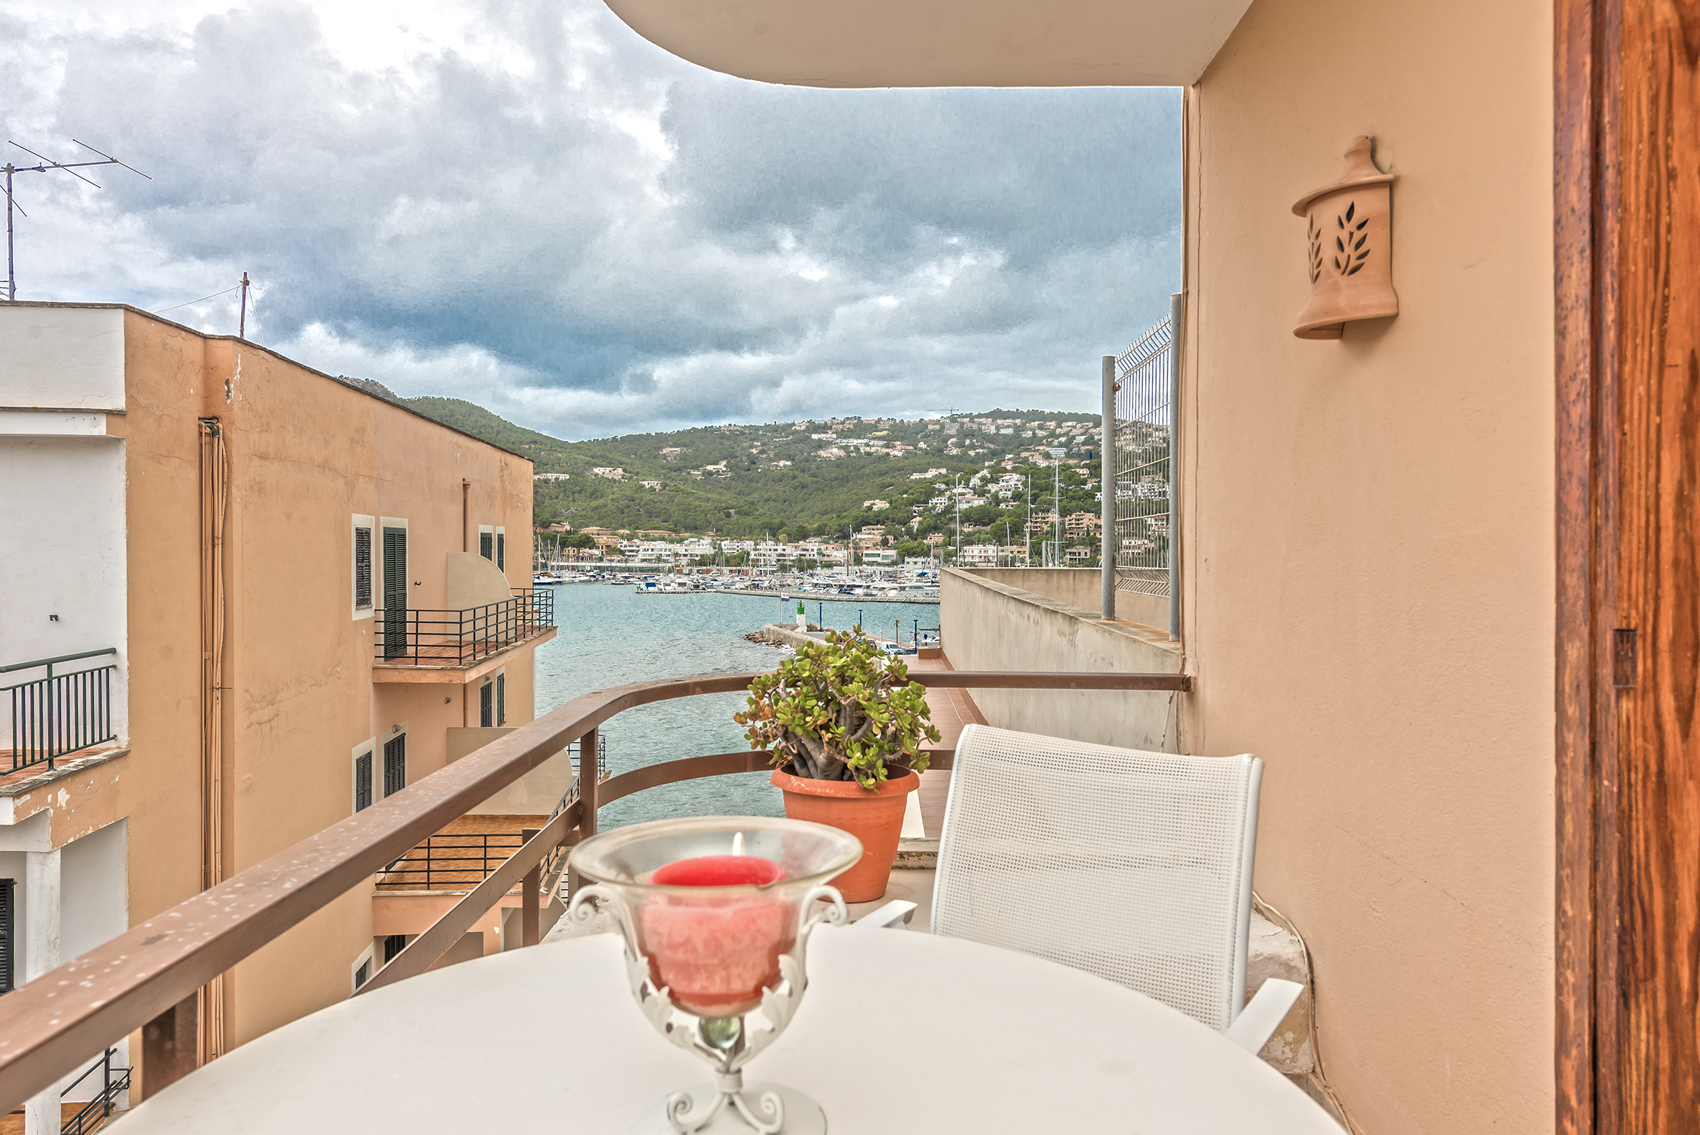 Balkon mit Bergblick in Mallorca